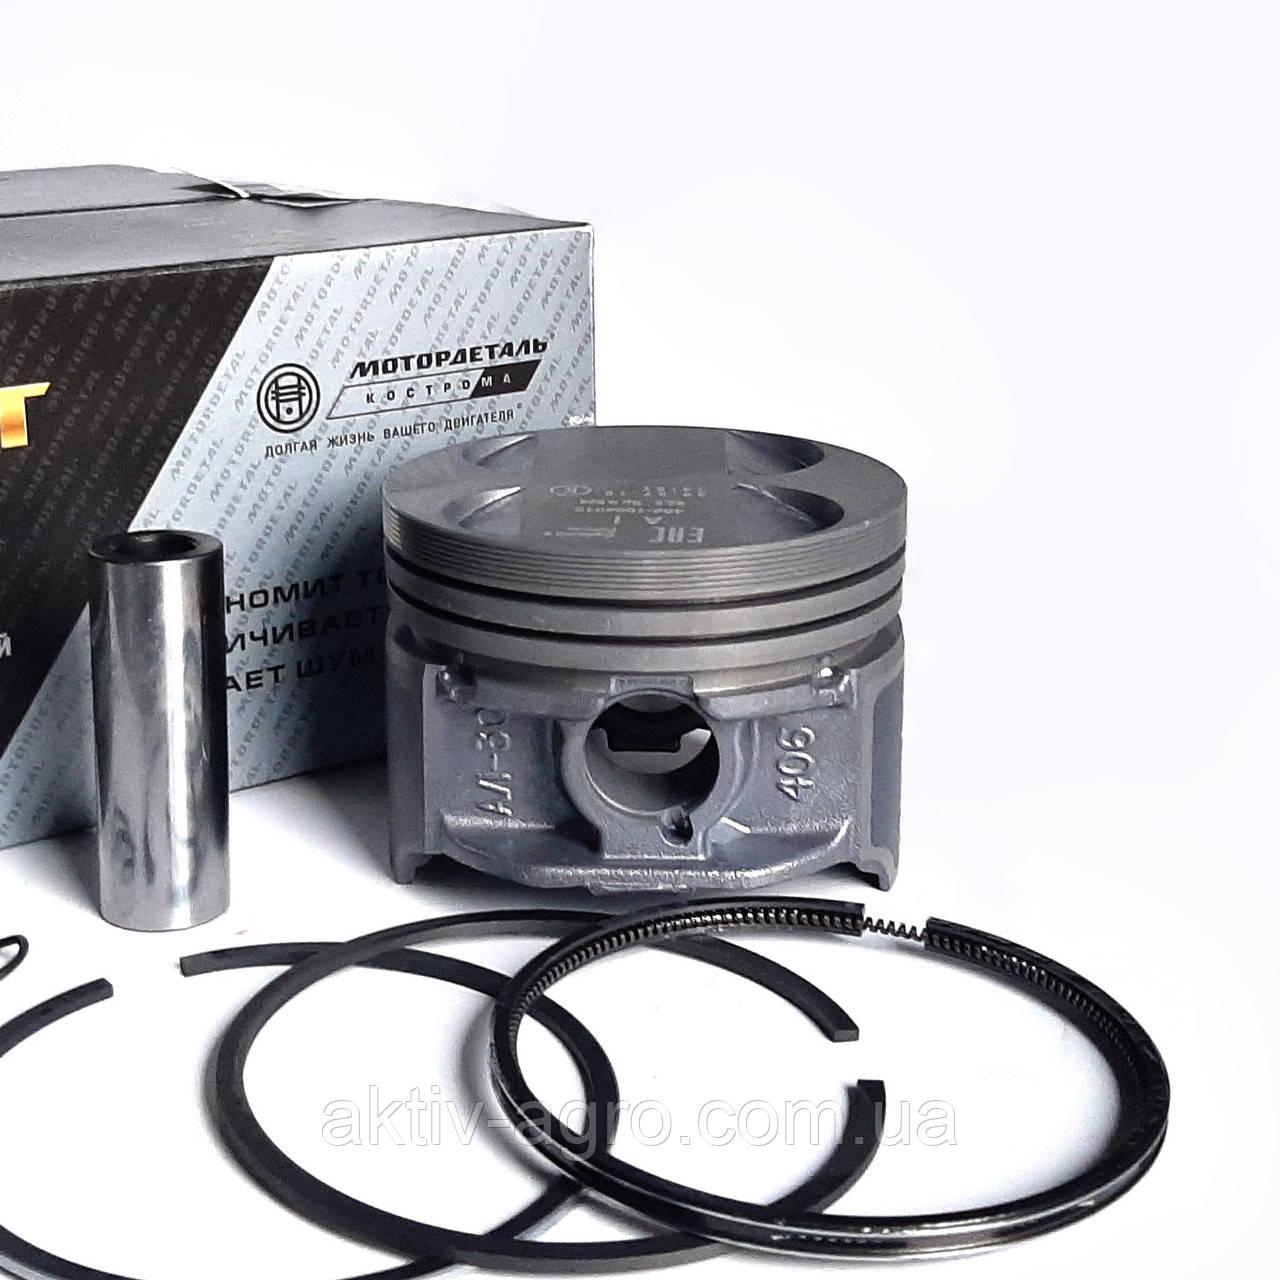 Моторокомплект 406.1004018-АР (Black Edition)